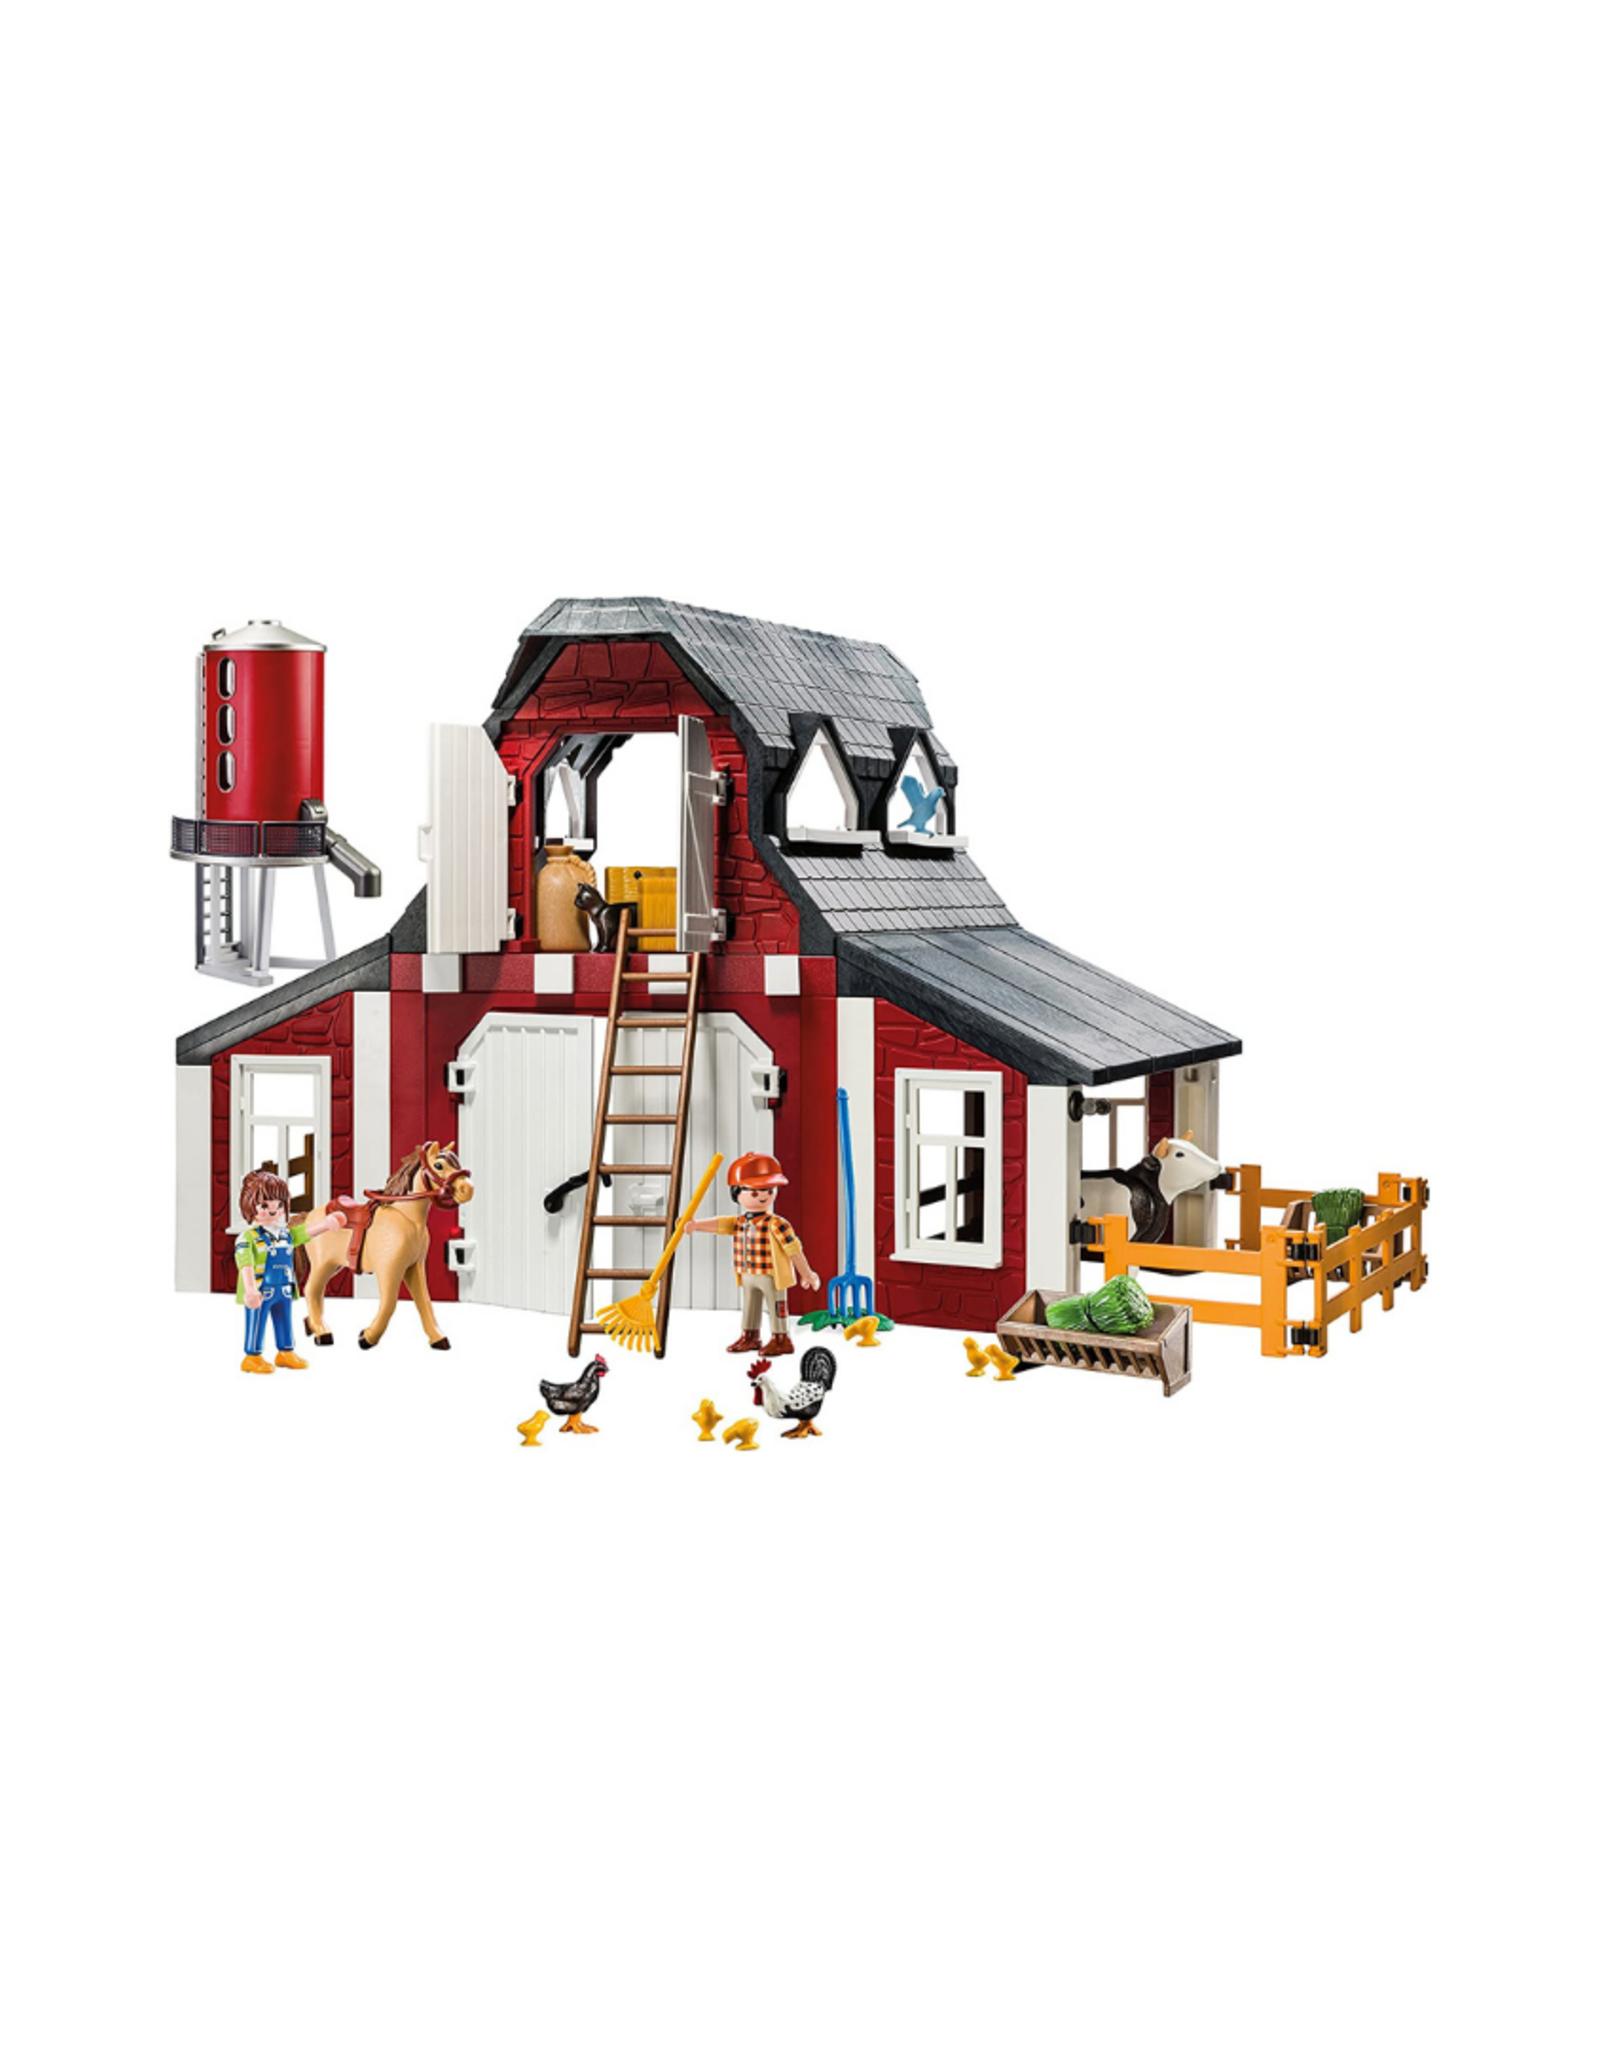 Playmobil PM - Barn with Silo